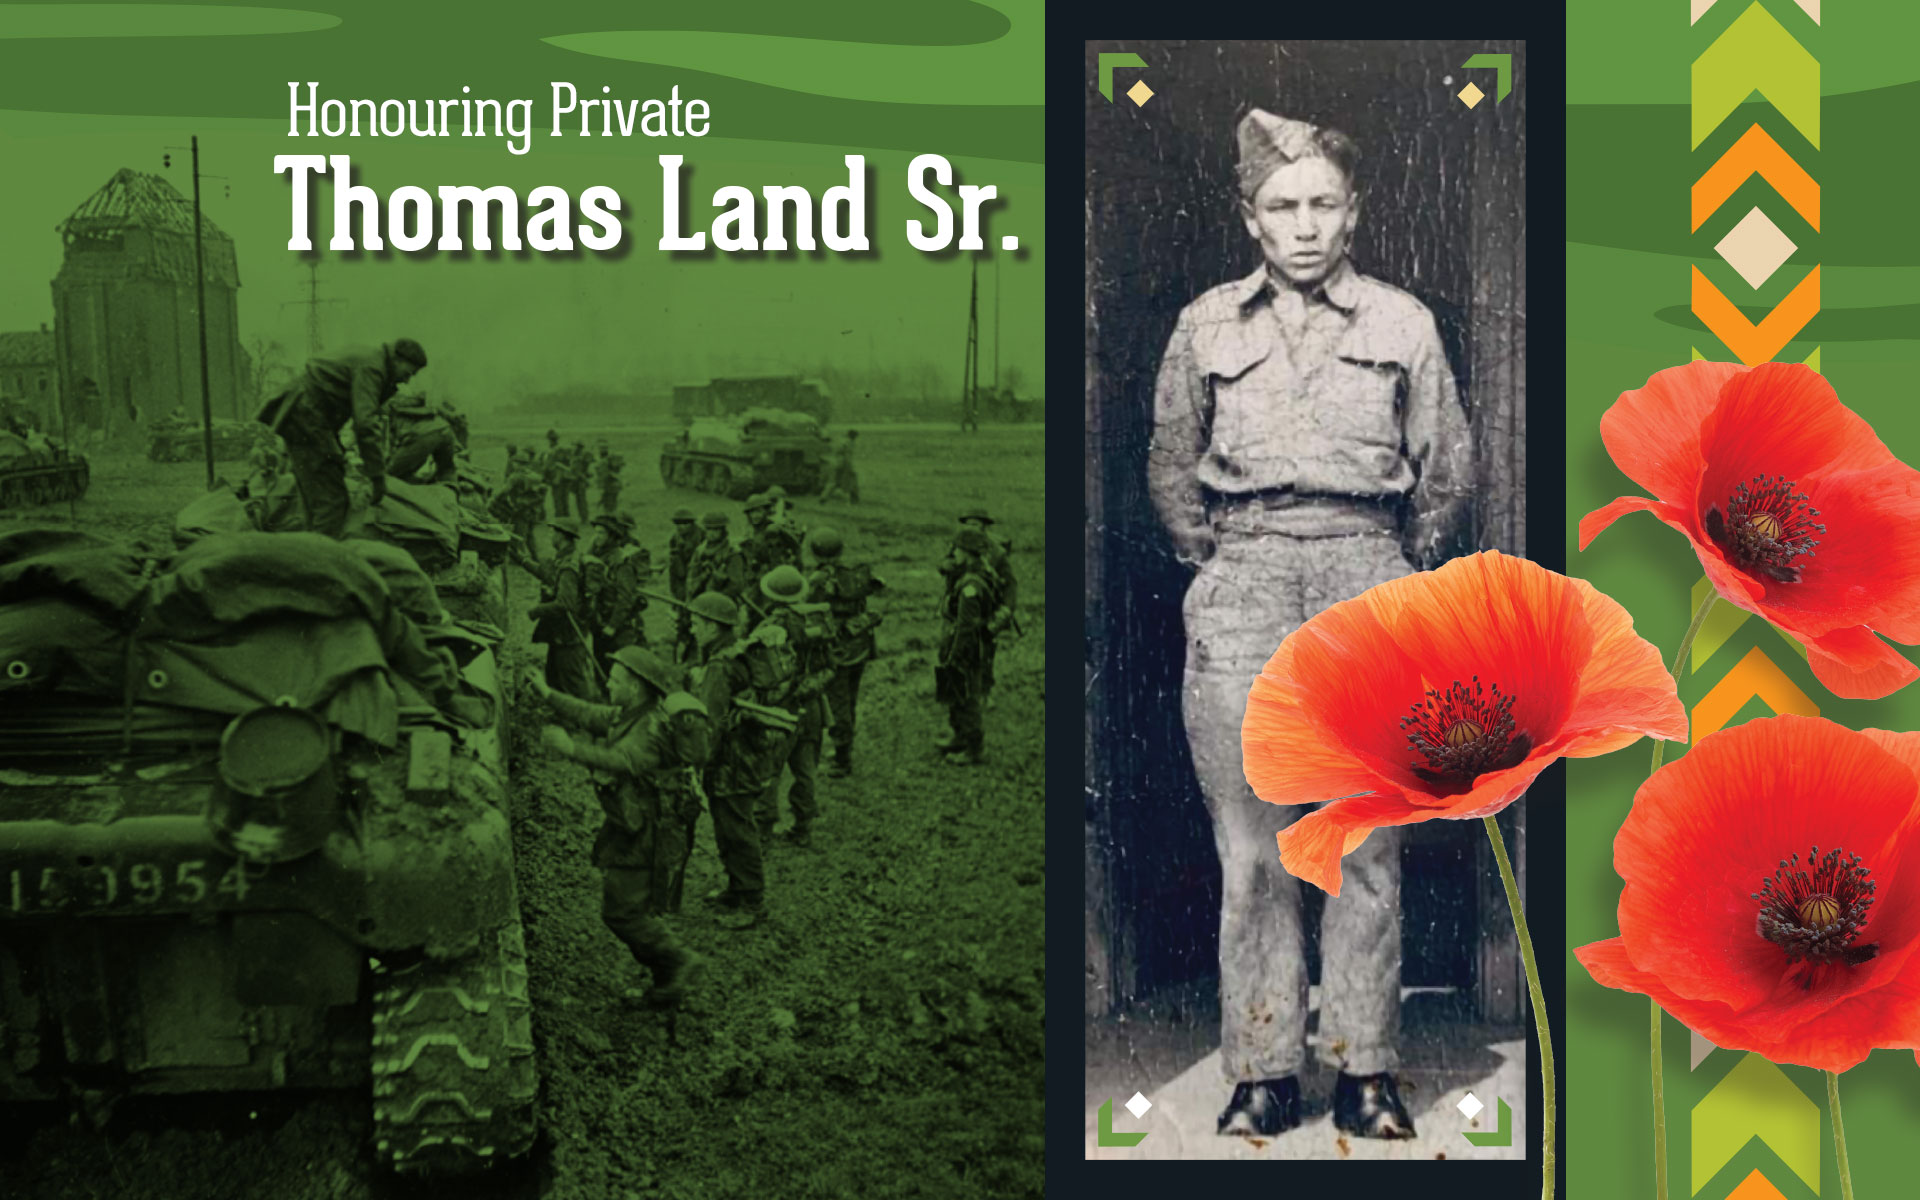 Honouring Private Thomas Land Sr.